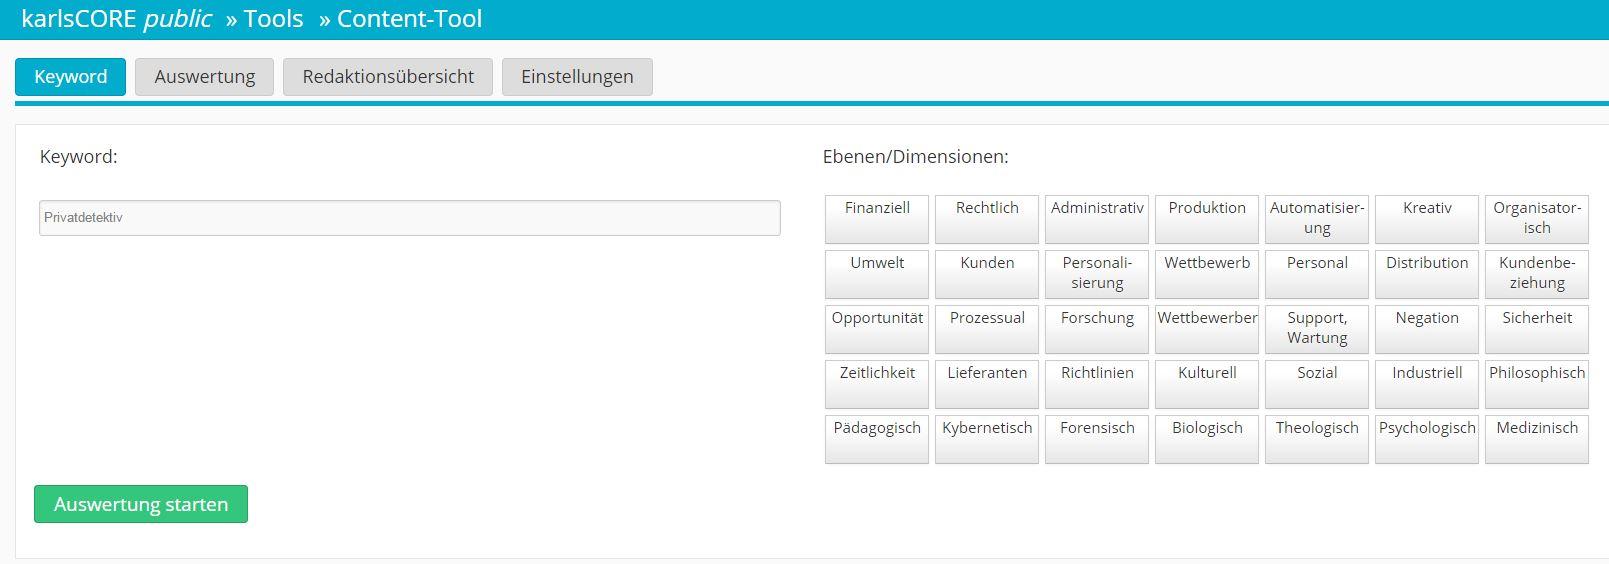 Screenshot_ Content Tool_ Karl Kratz1